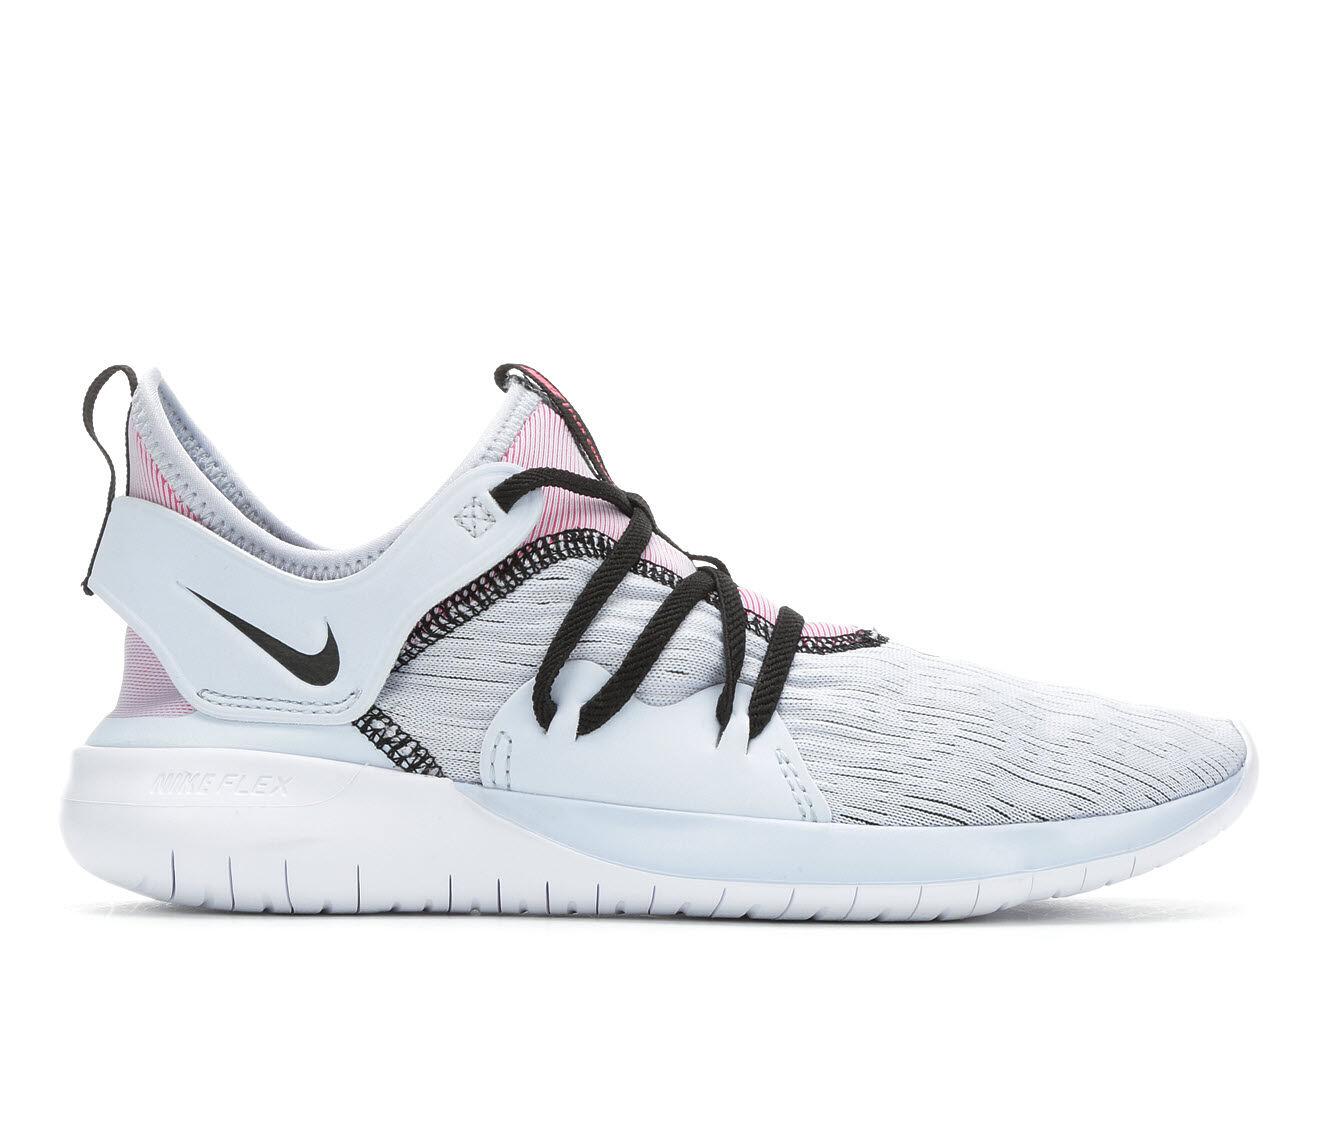 Women's Nike Flex Contact 3 Running Shoes Blue/Black/Pink